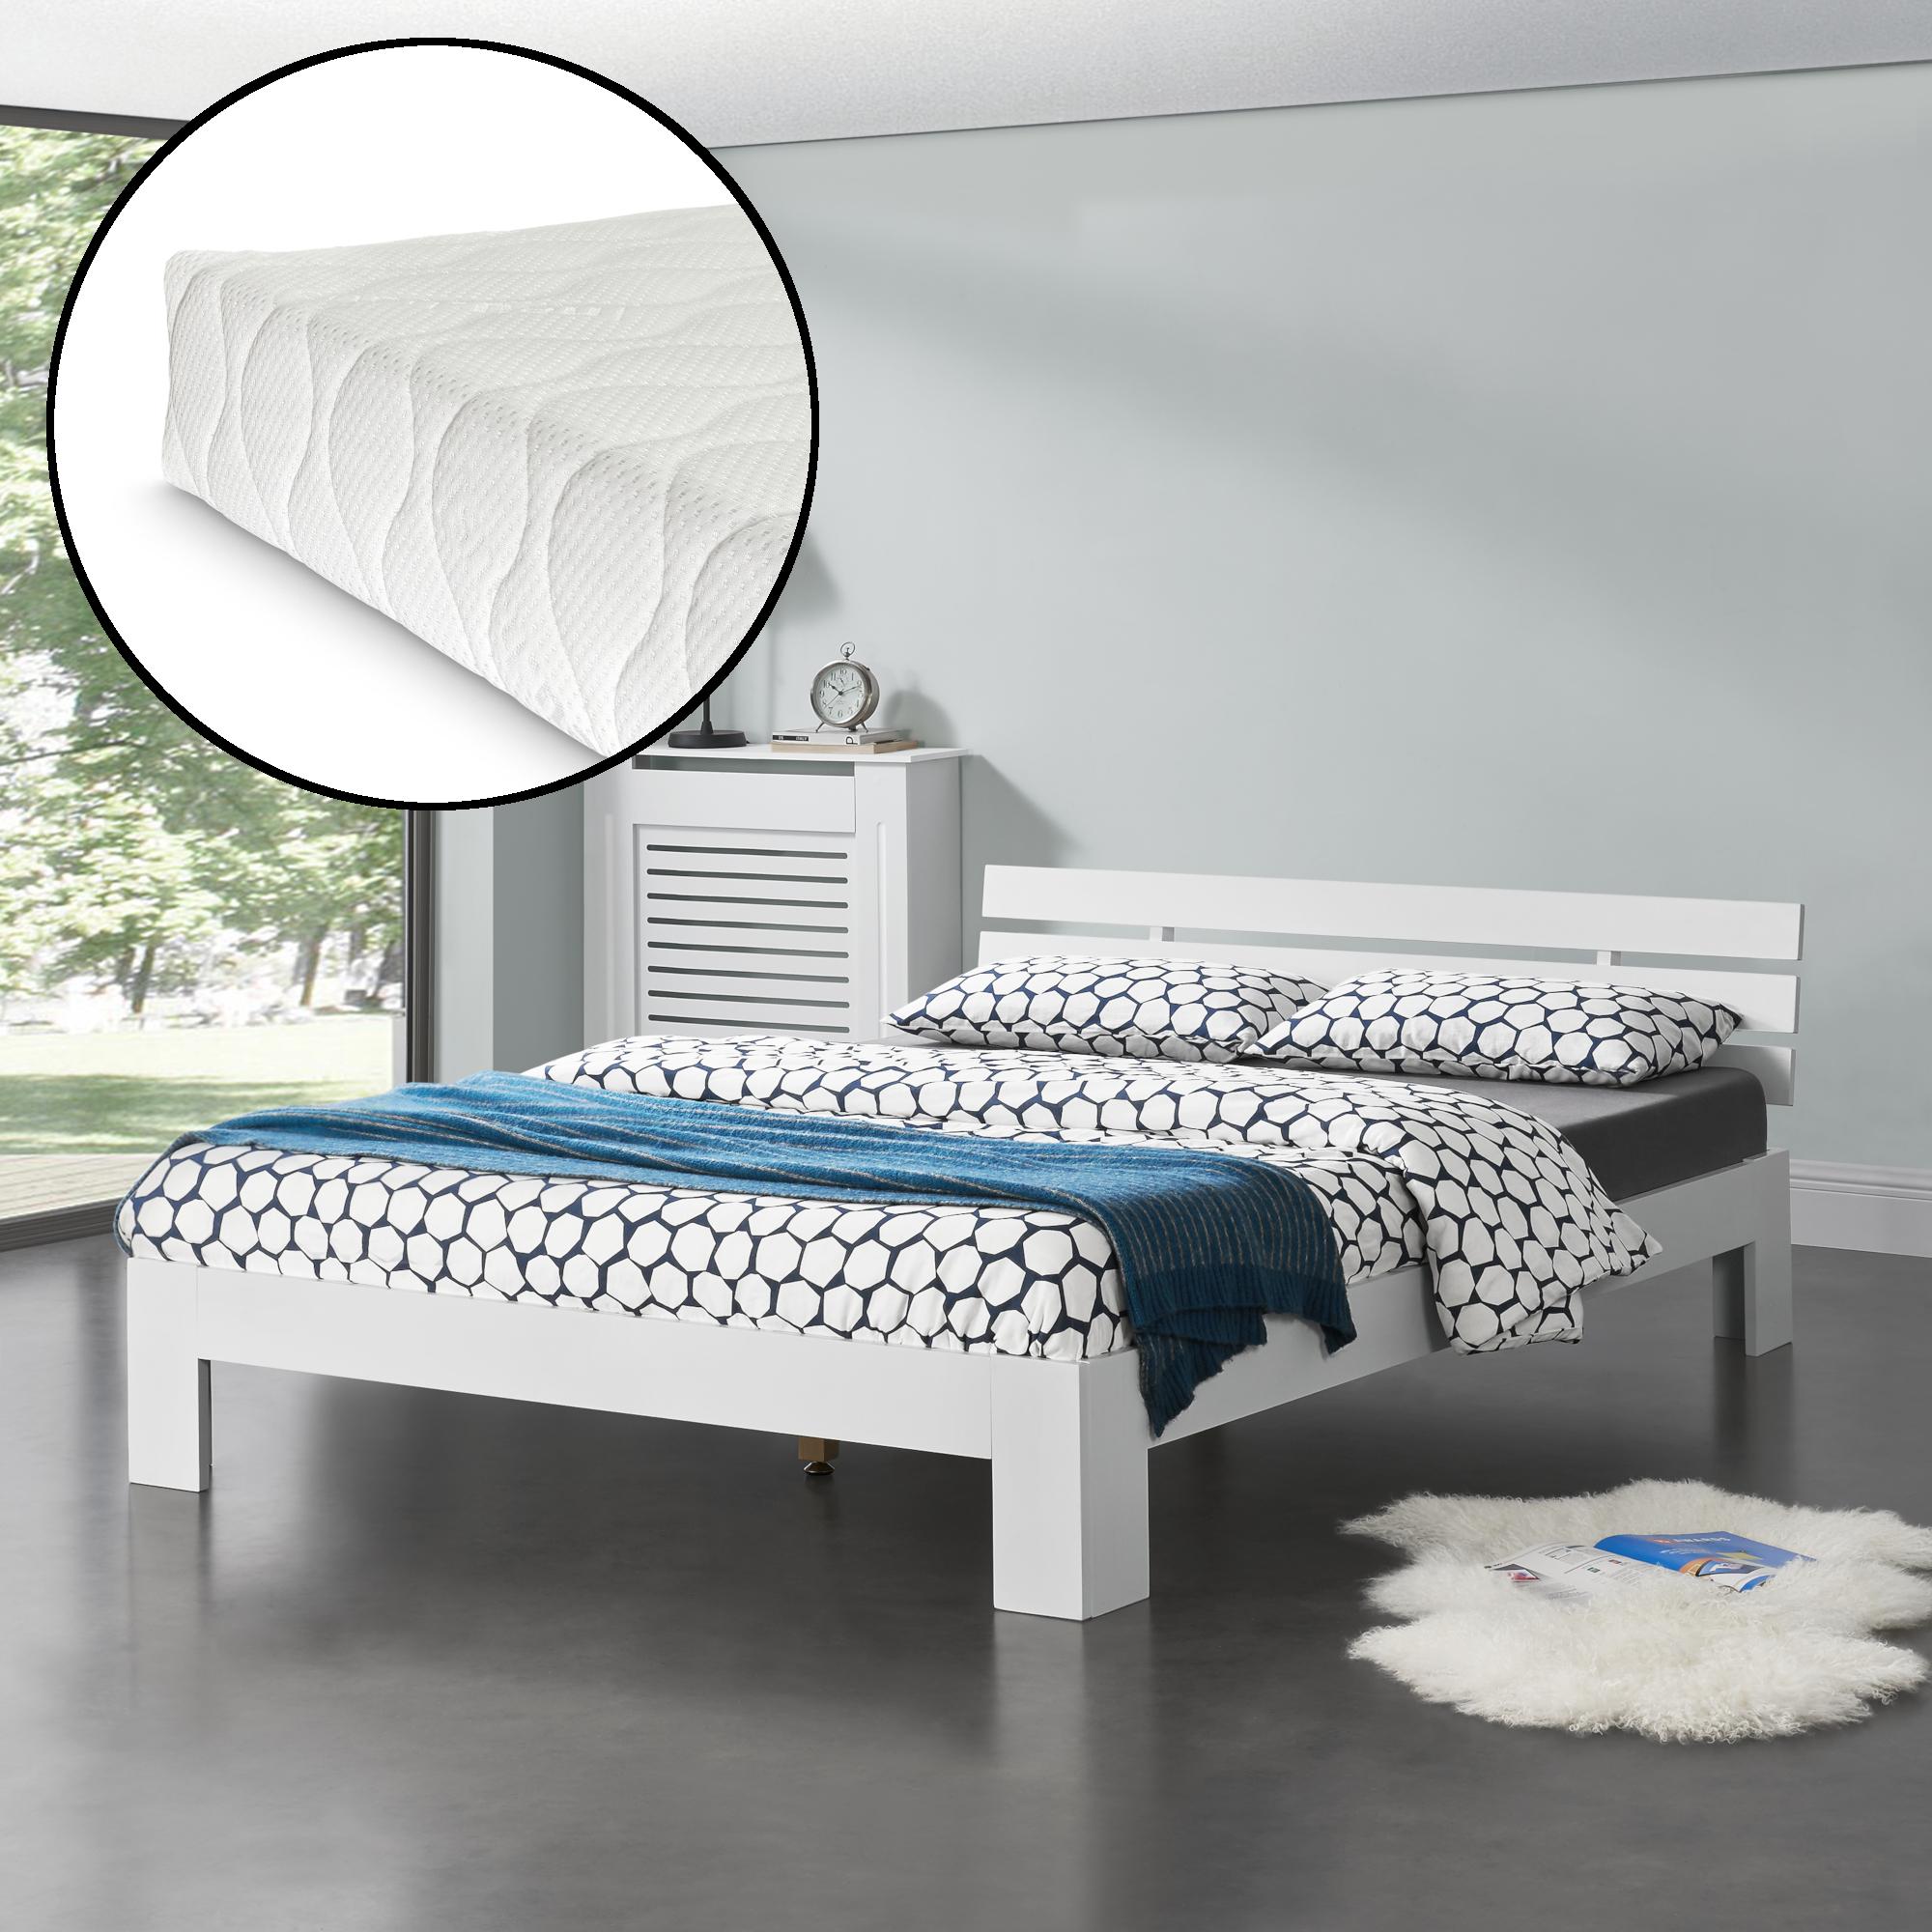 Full Size of Klappbares Doppelbett Encasa Holzbett 140x200cm Mit Matratze Bett Kiefer Ausklappbares Wohnzimmer Klappbares Doppelbett